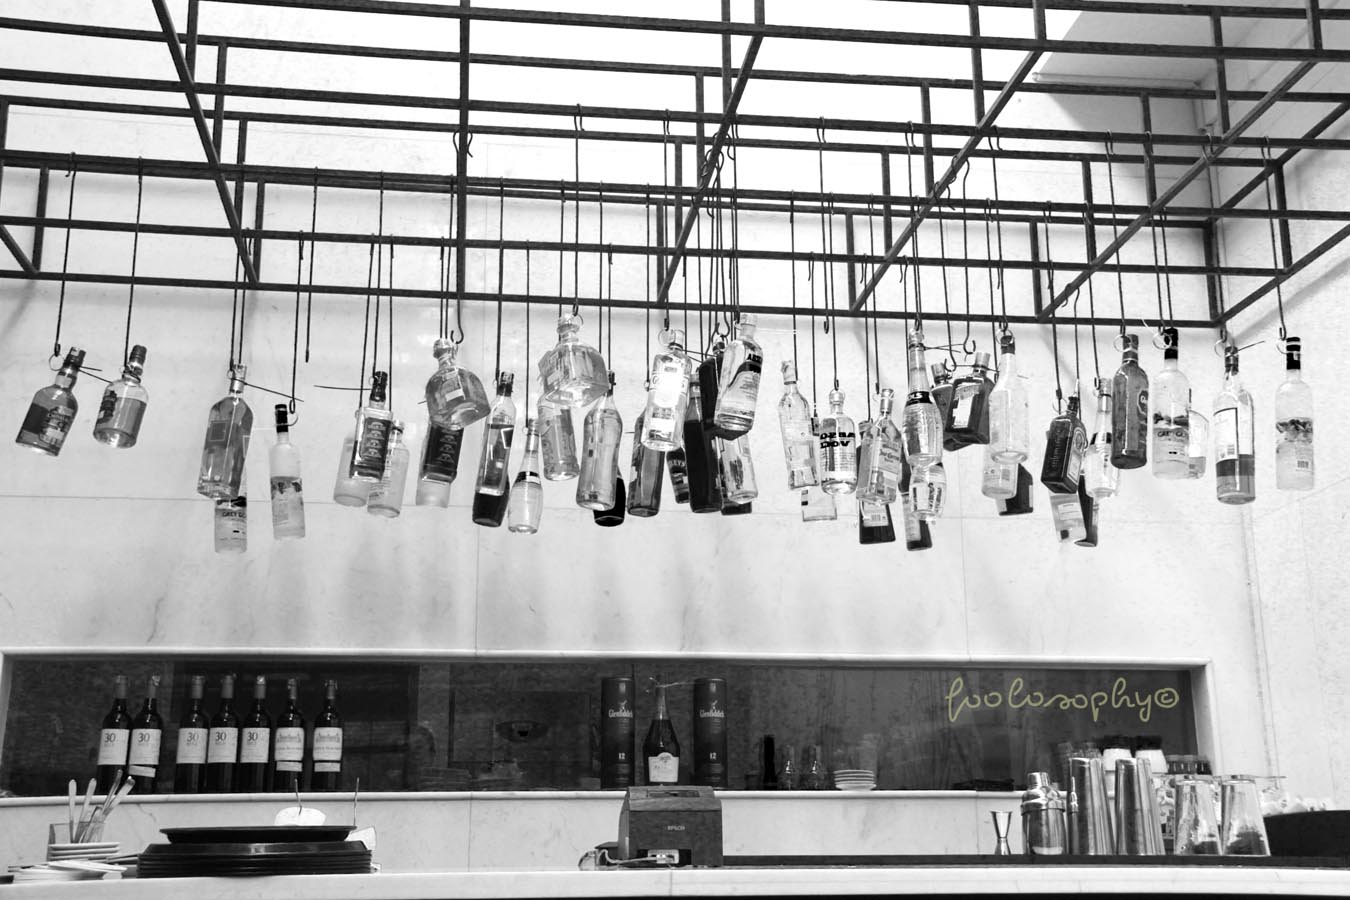 Mojo Kitchen & Bar - F O O L O S O P H Y - Jakarta Food Blog